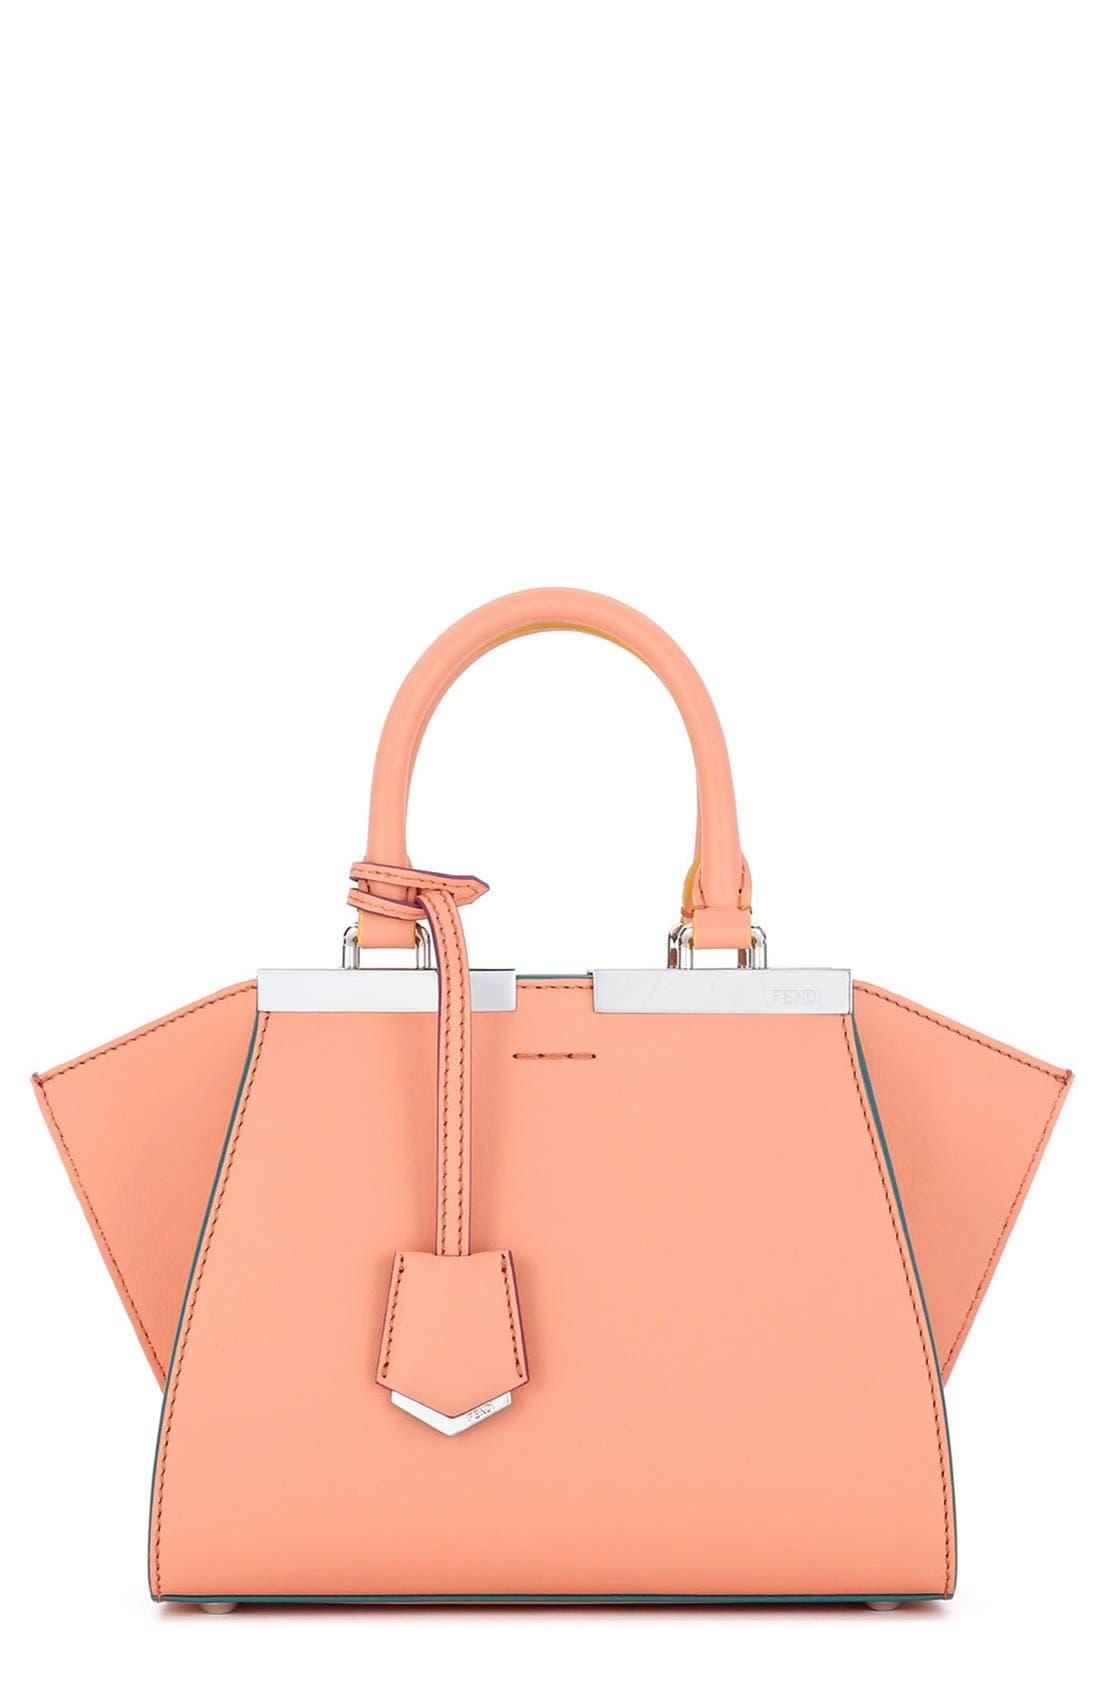 Fendi 'Mini 3Jours' Calfskin Leather Shopper